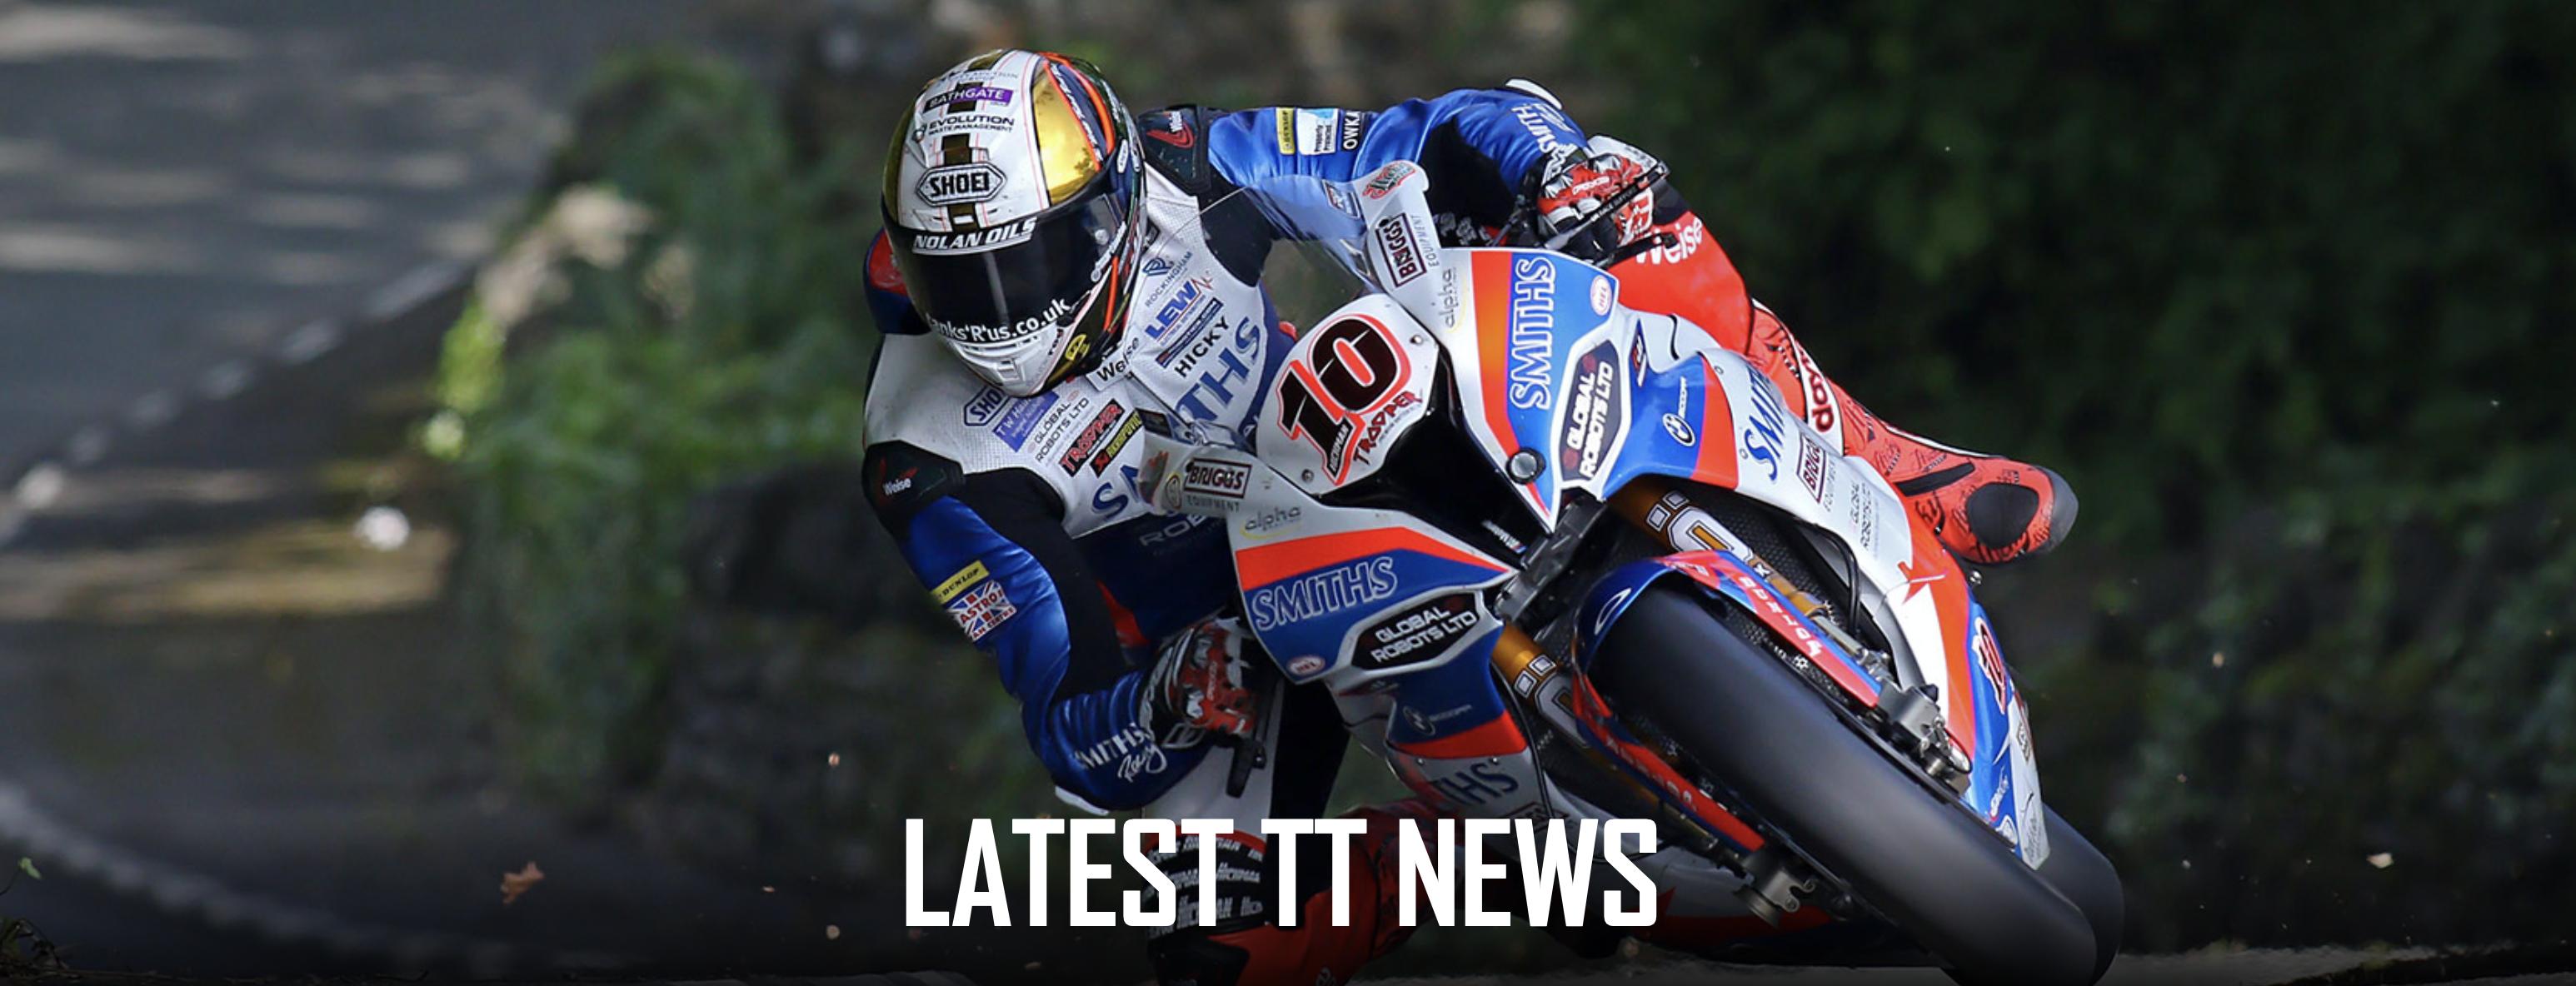 2021 Isle of Man TT Cancelled?